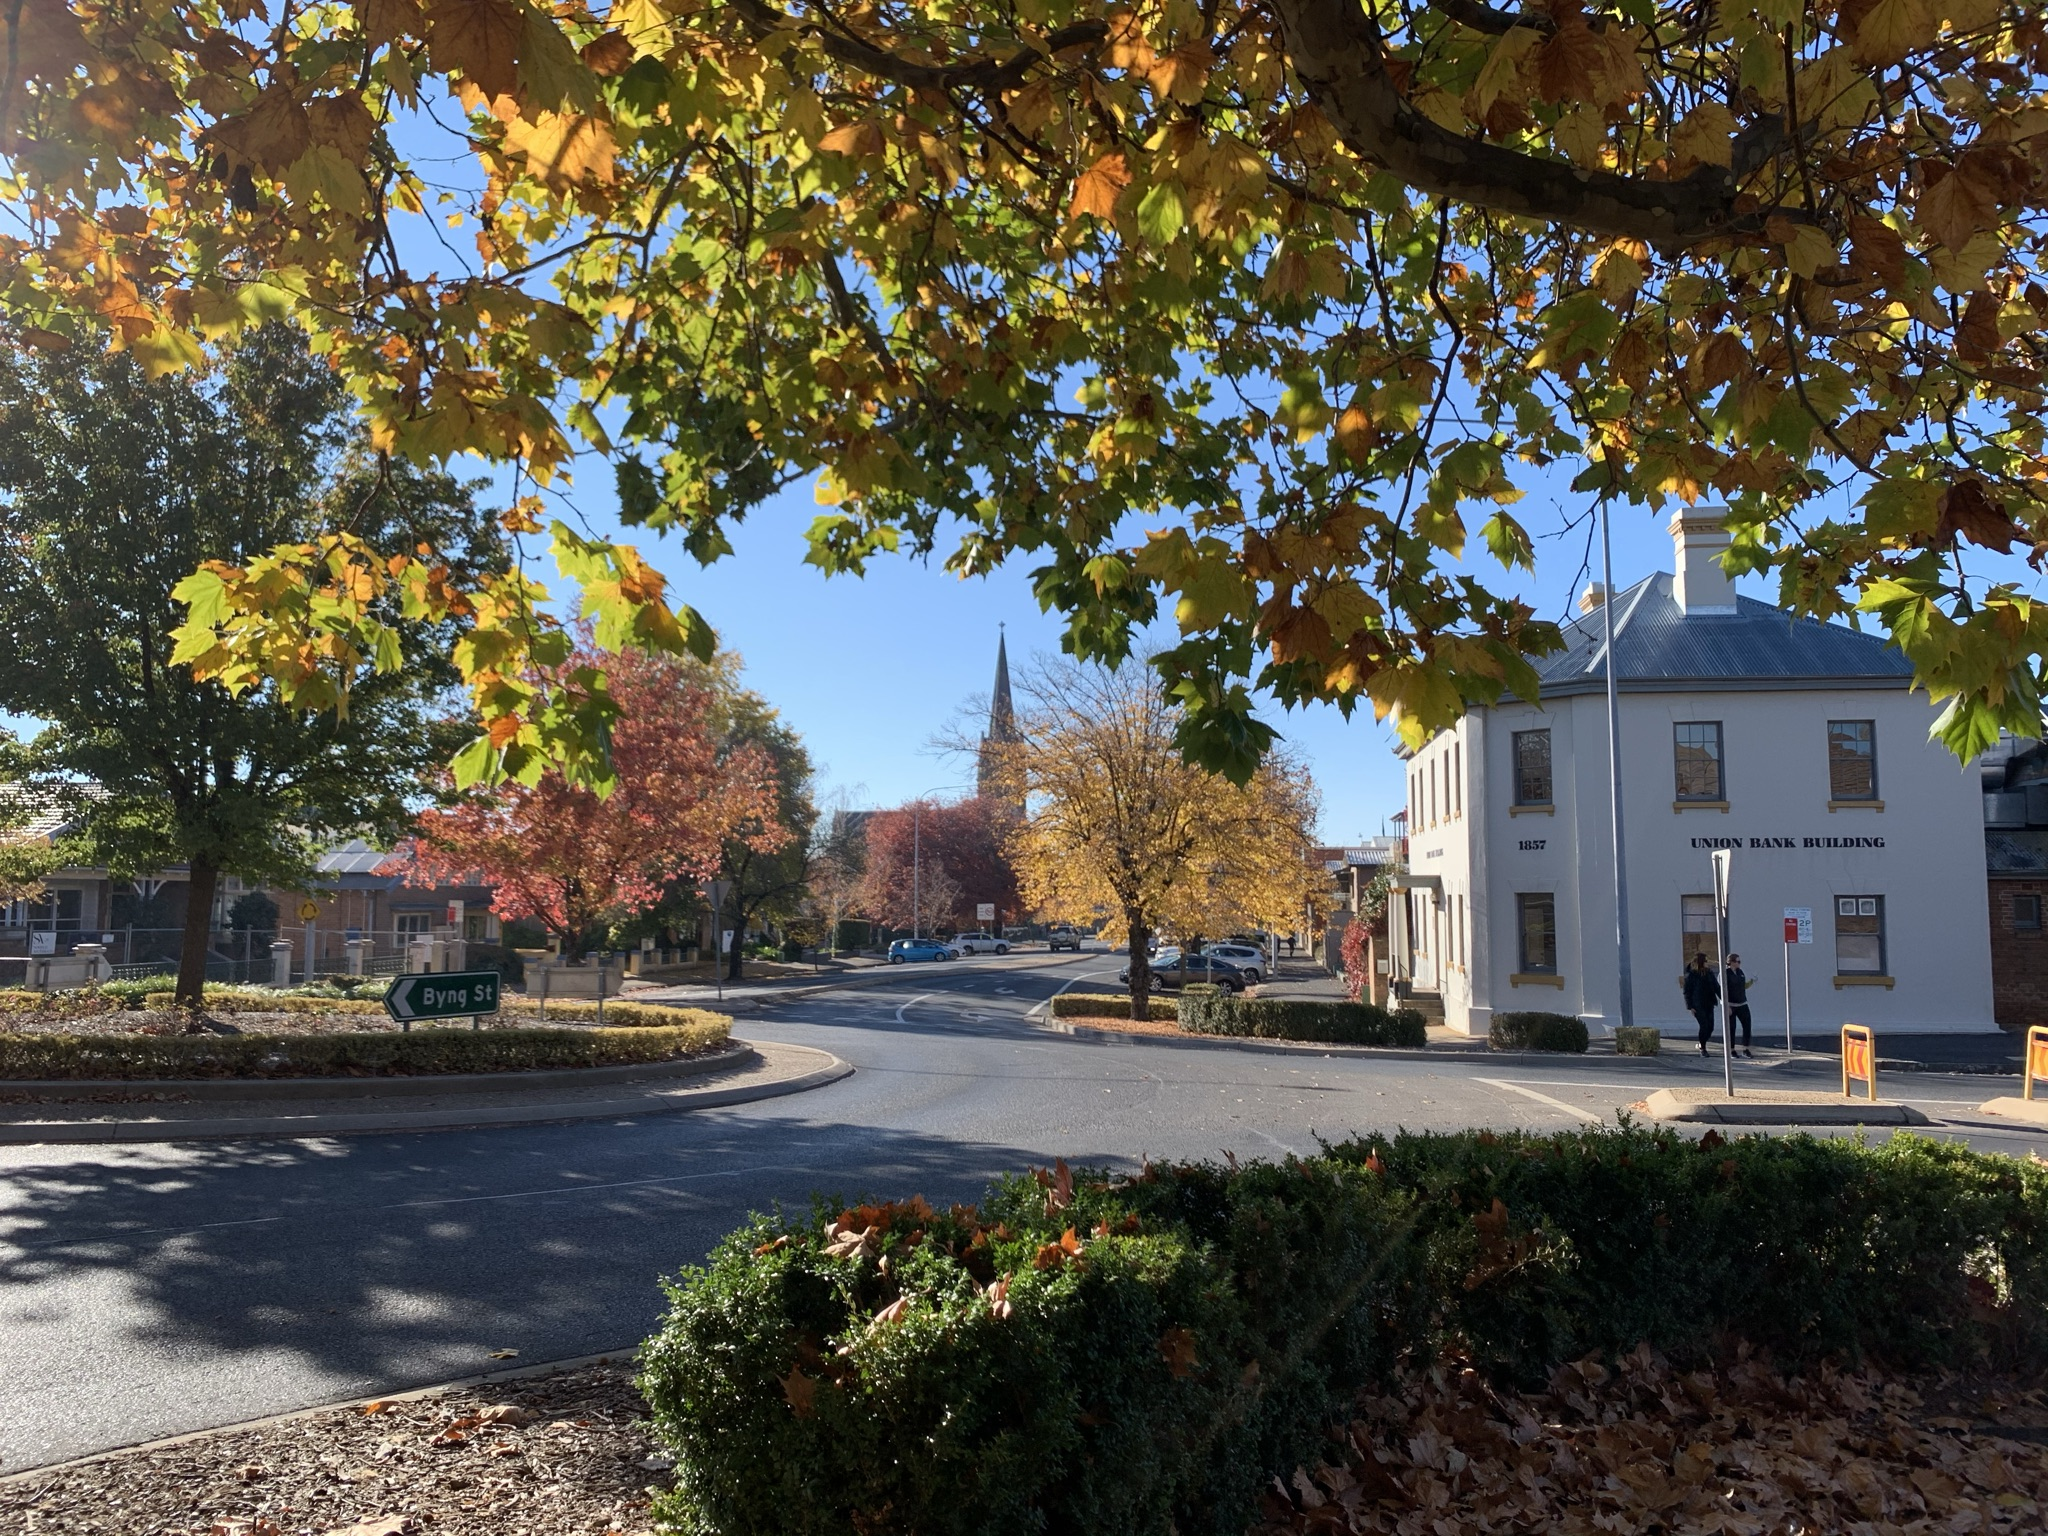 Autumn leaves in street of Orange